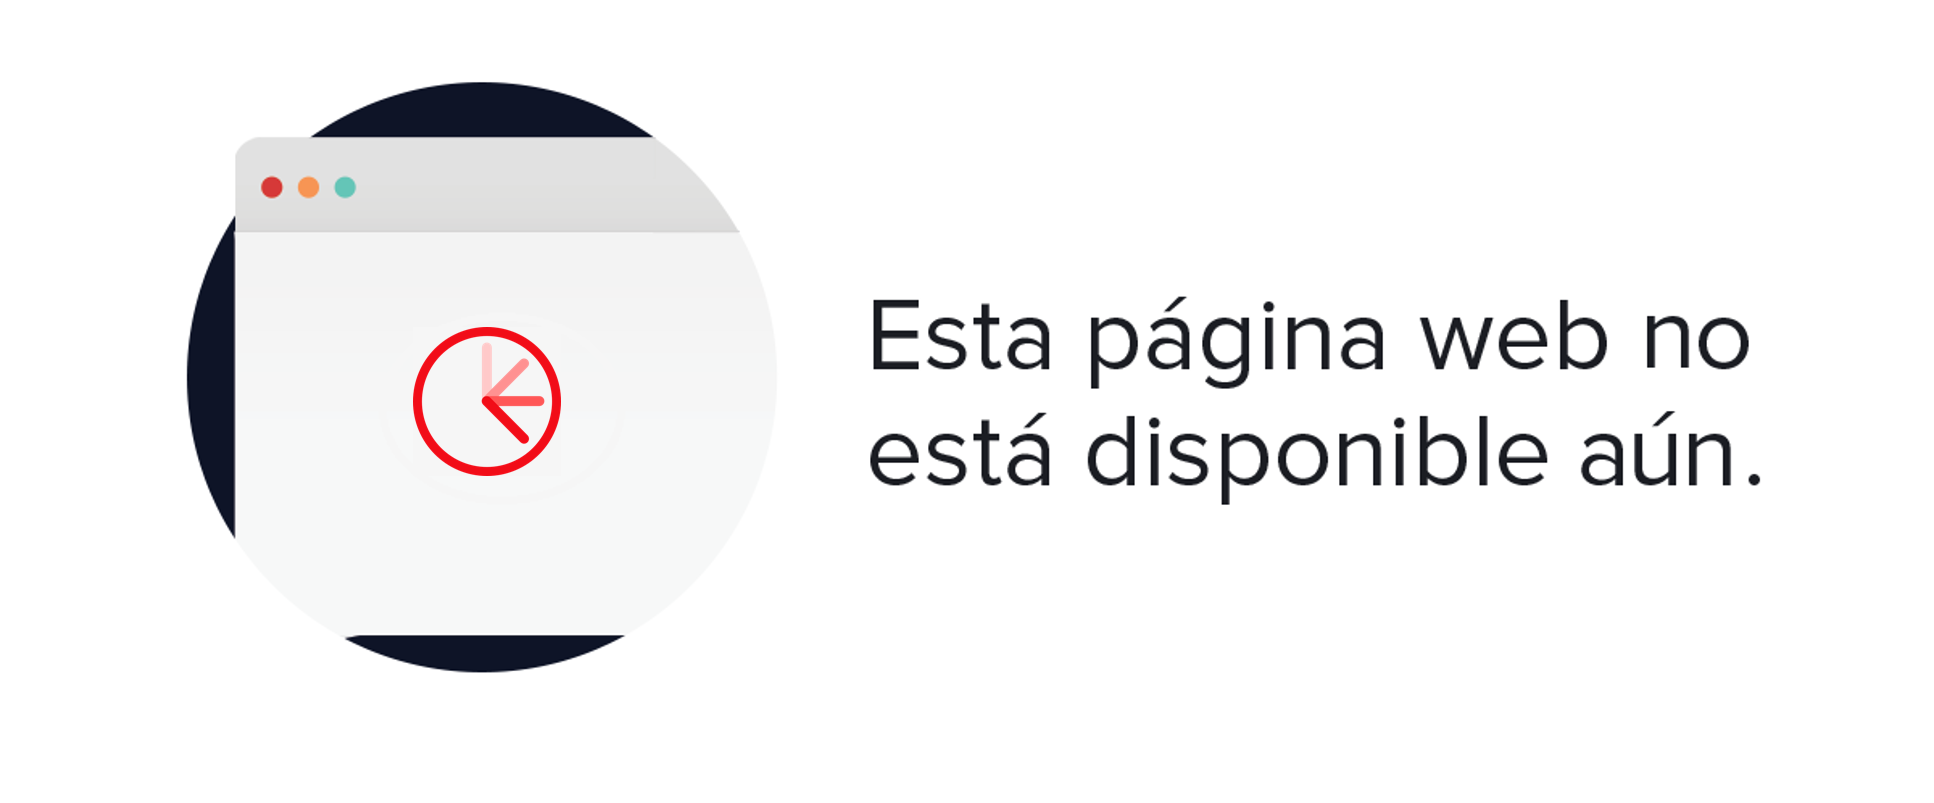 Bolsas de Papel Personalizadas con Asa Rizada Medidas 32+9x26 cm 110gr